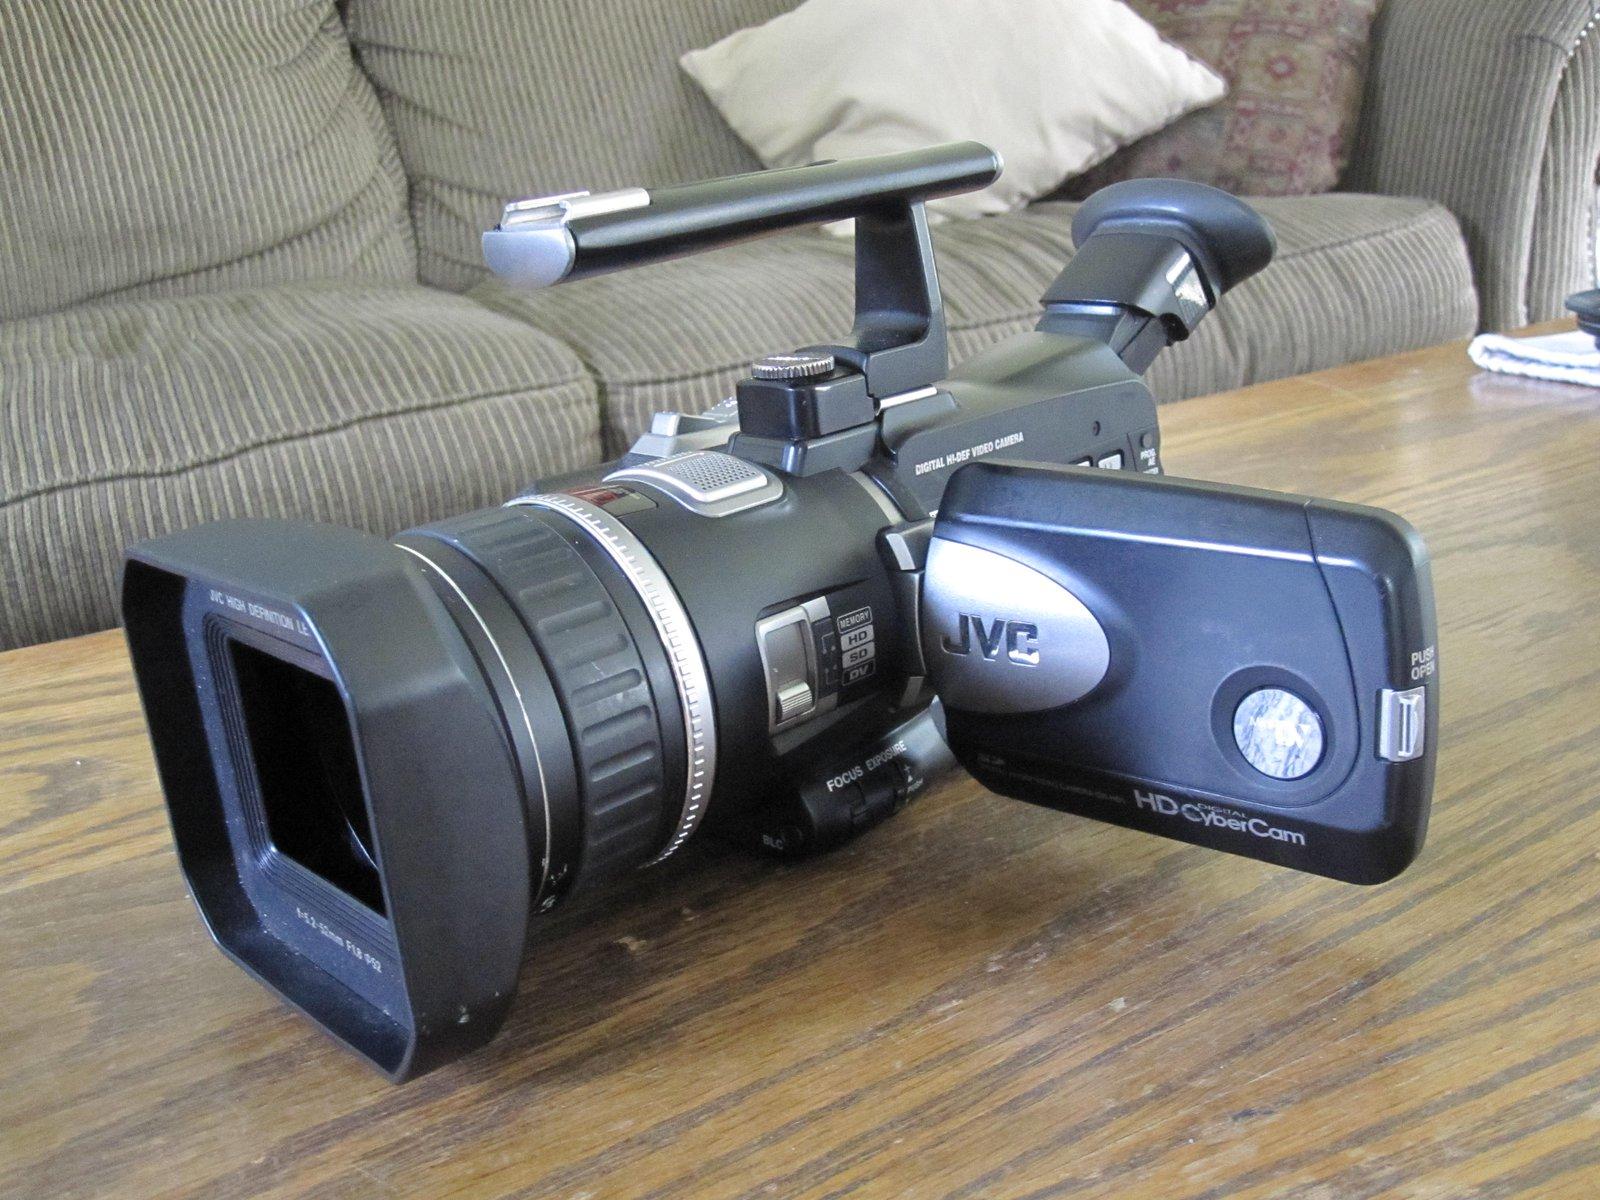 #5 camera